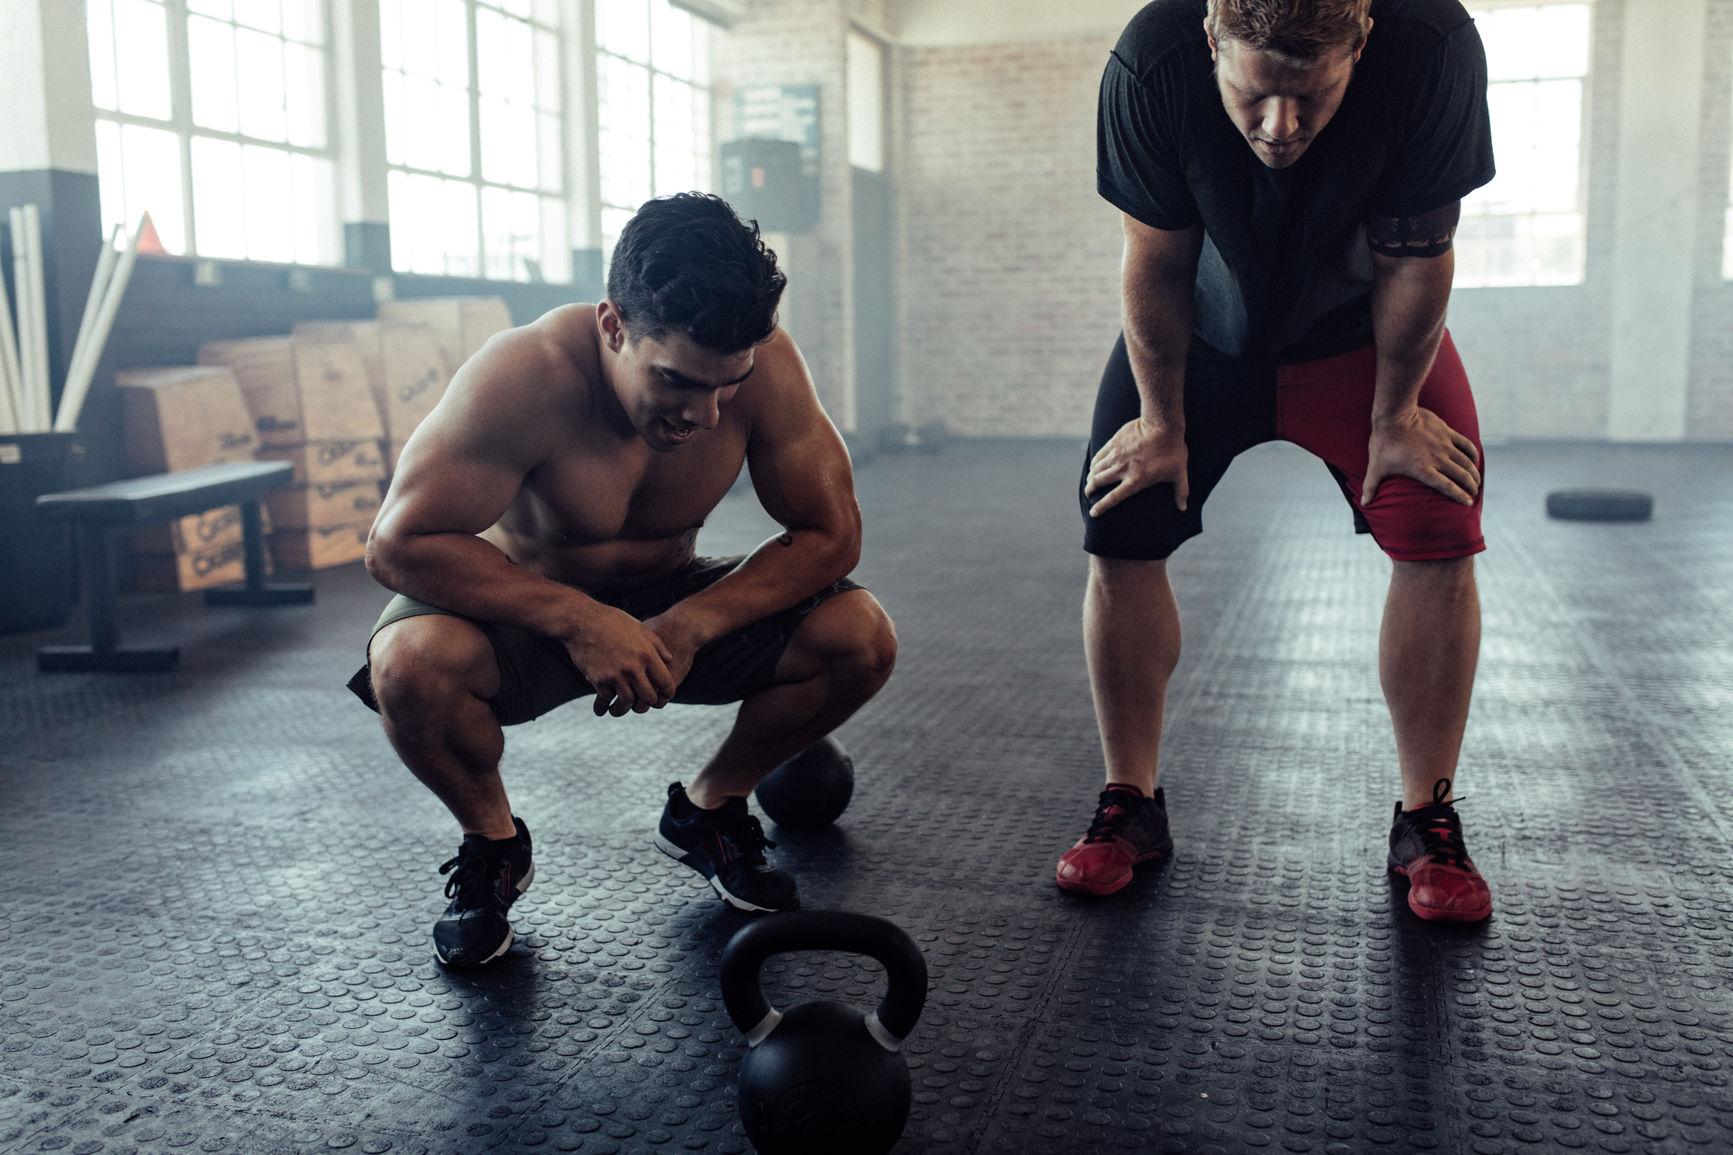 workout sore的圖片搜尋結果